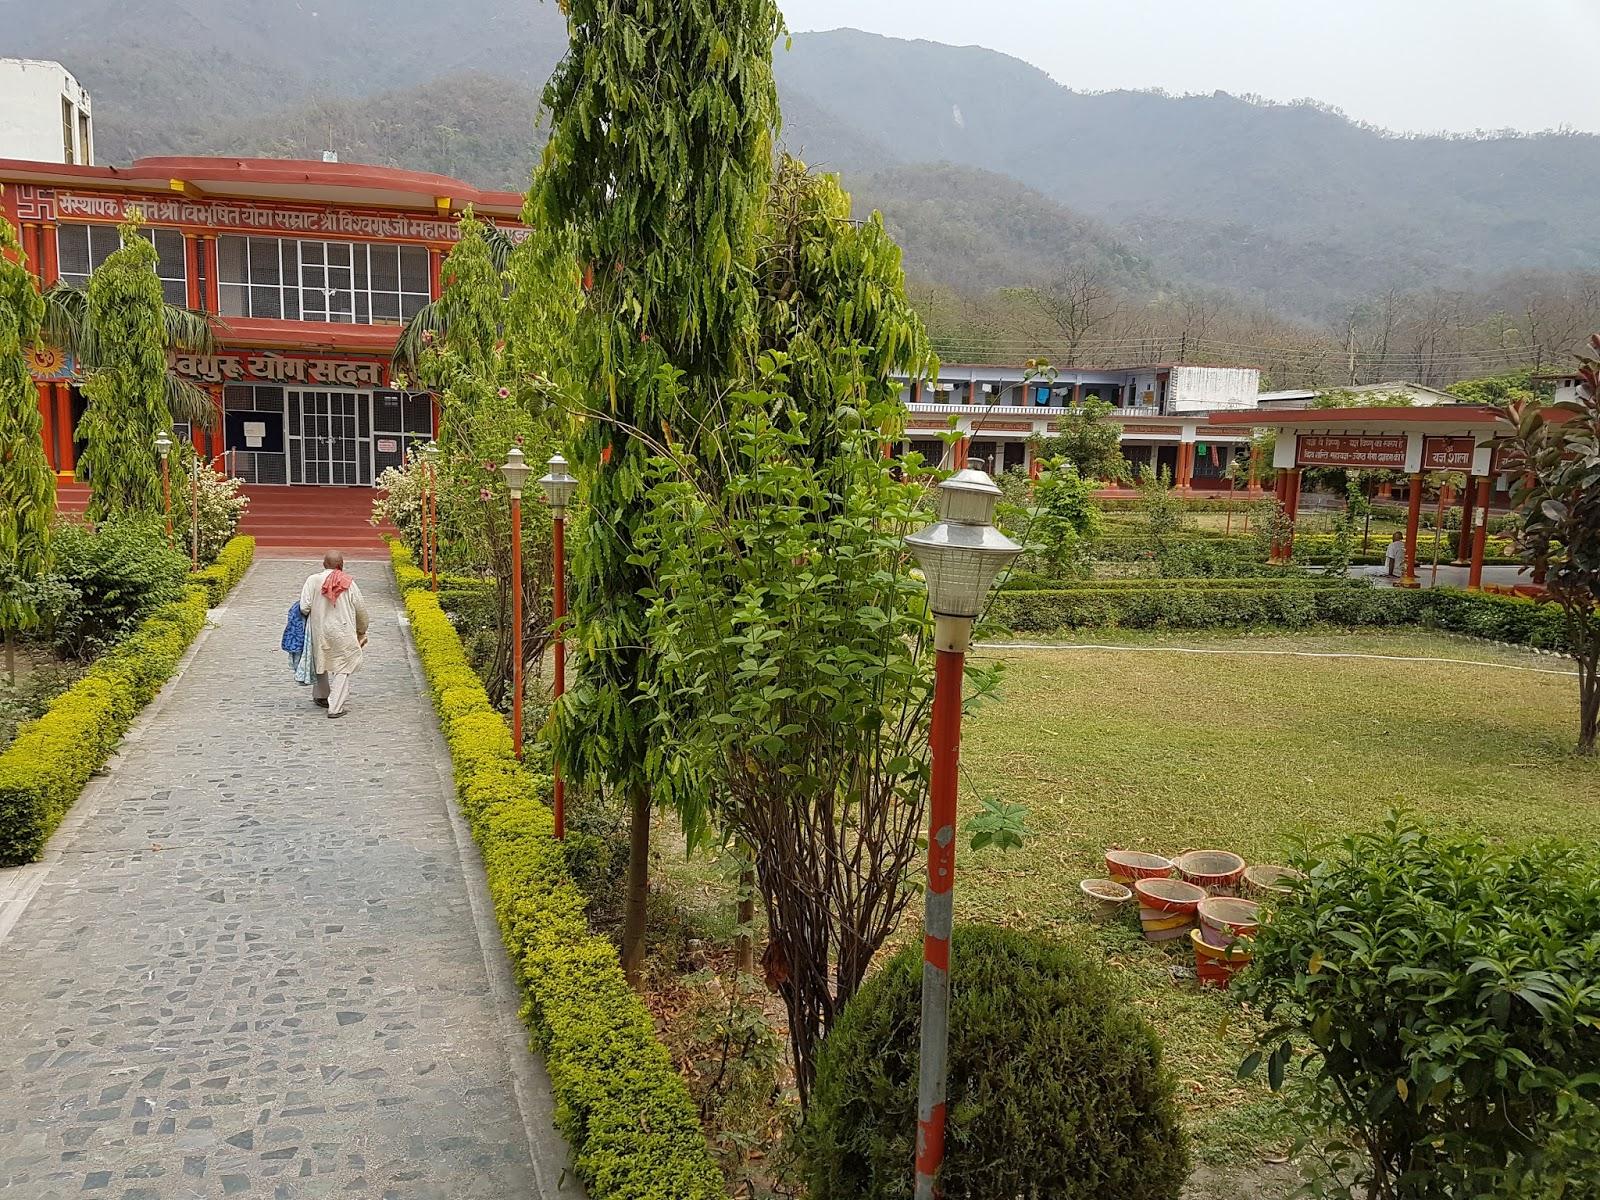 Ved Niketan - Staying in an ashram in India - Ummi Goes Where?